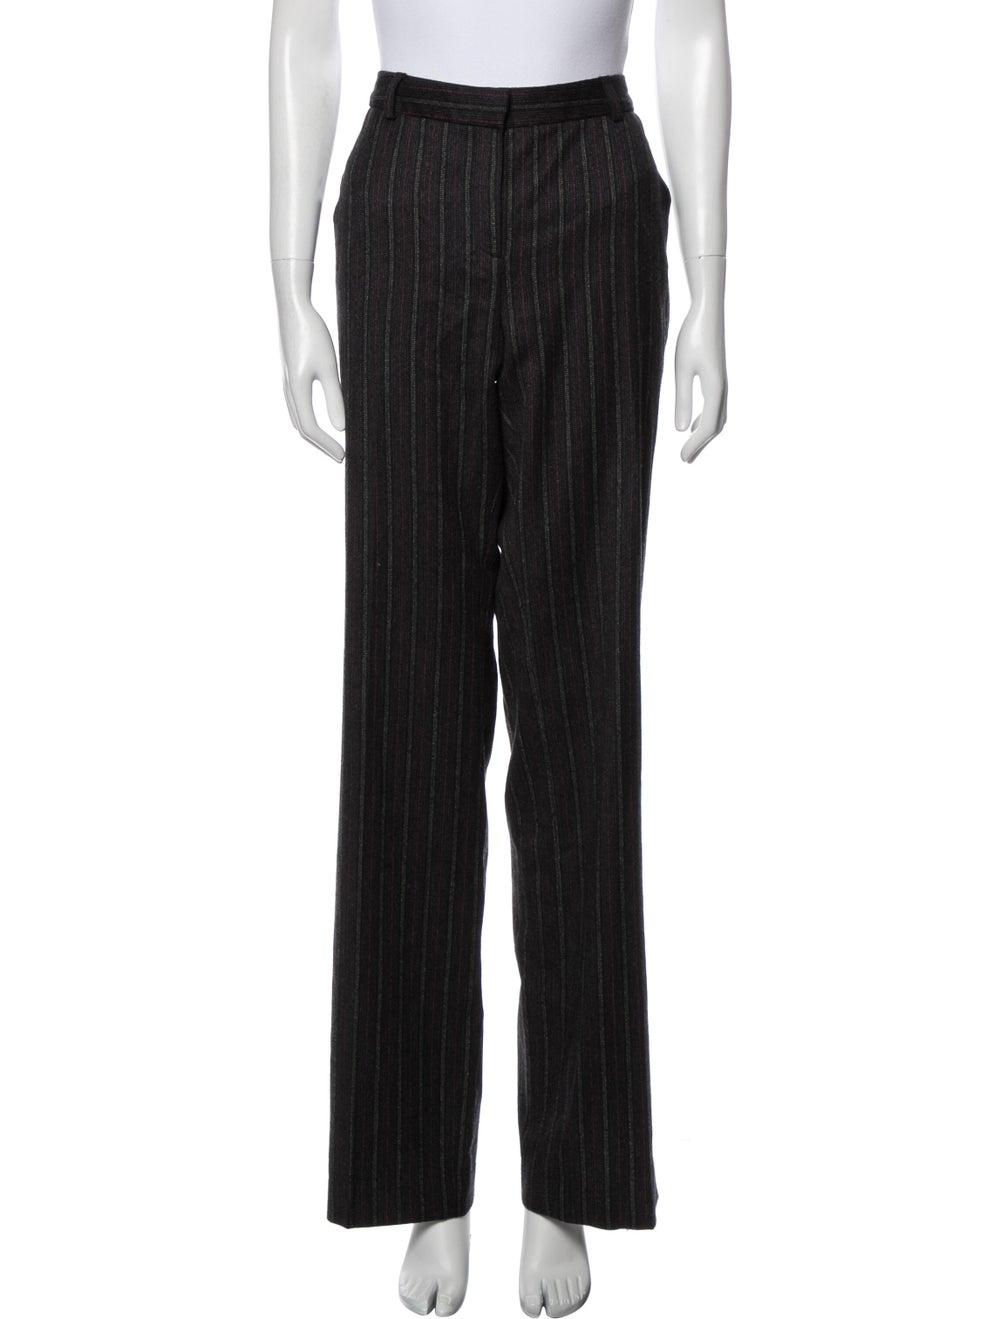 Missoni Striped Wide Leg Pants Black - image 1